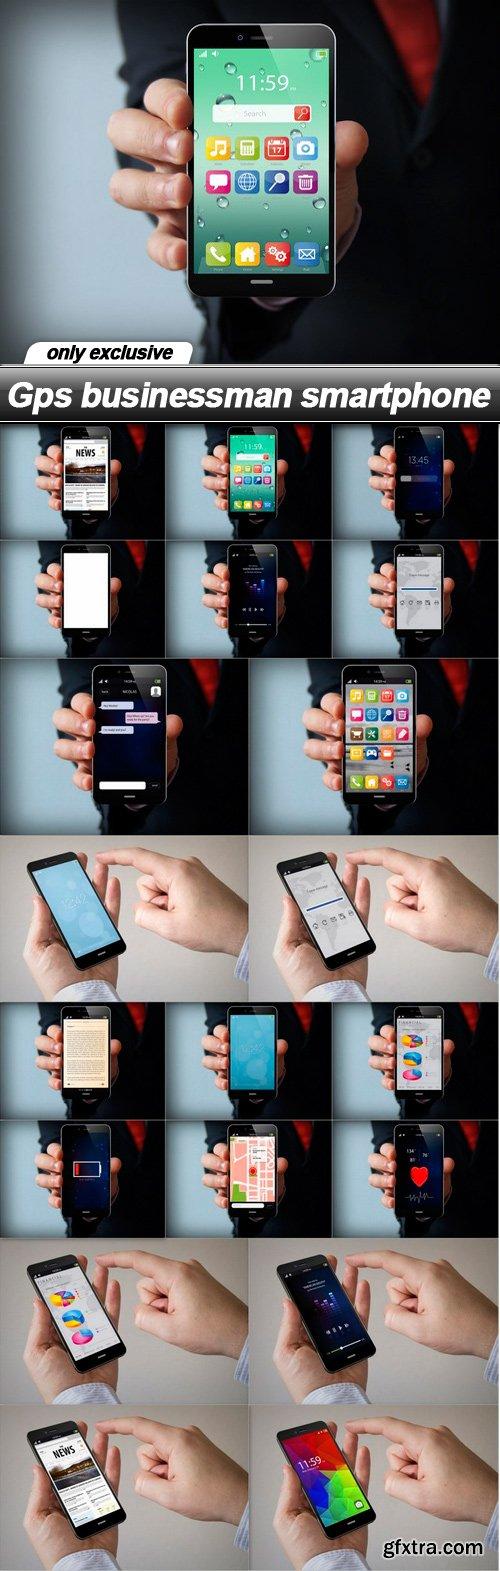 Gps businessman smartphone - 20 UHQ JPEG